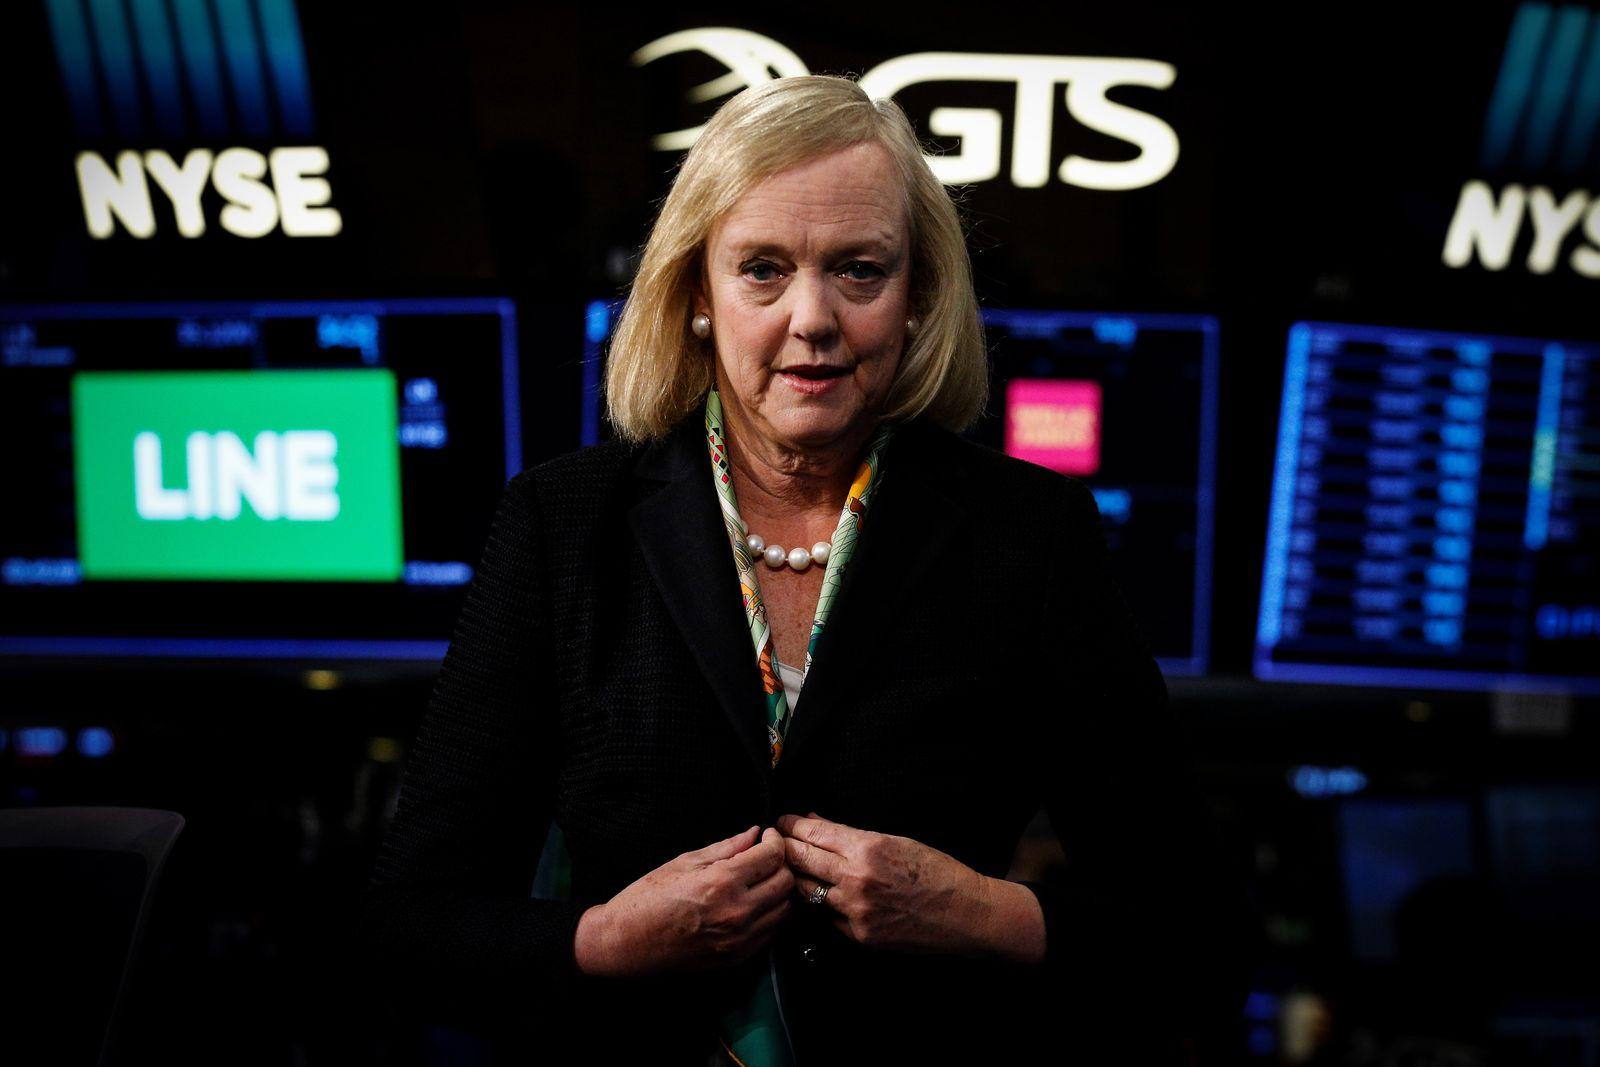 Forbes/ Meg Whitman